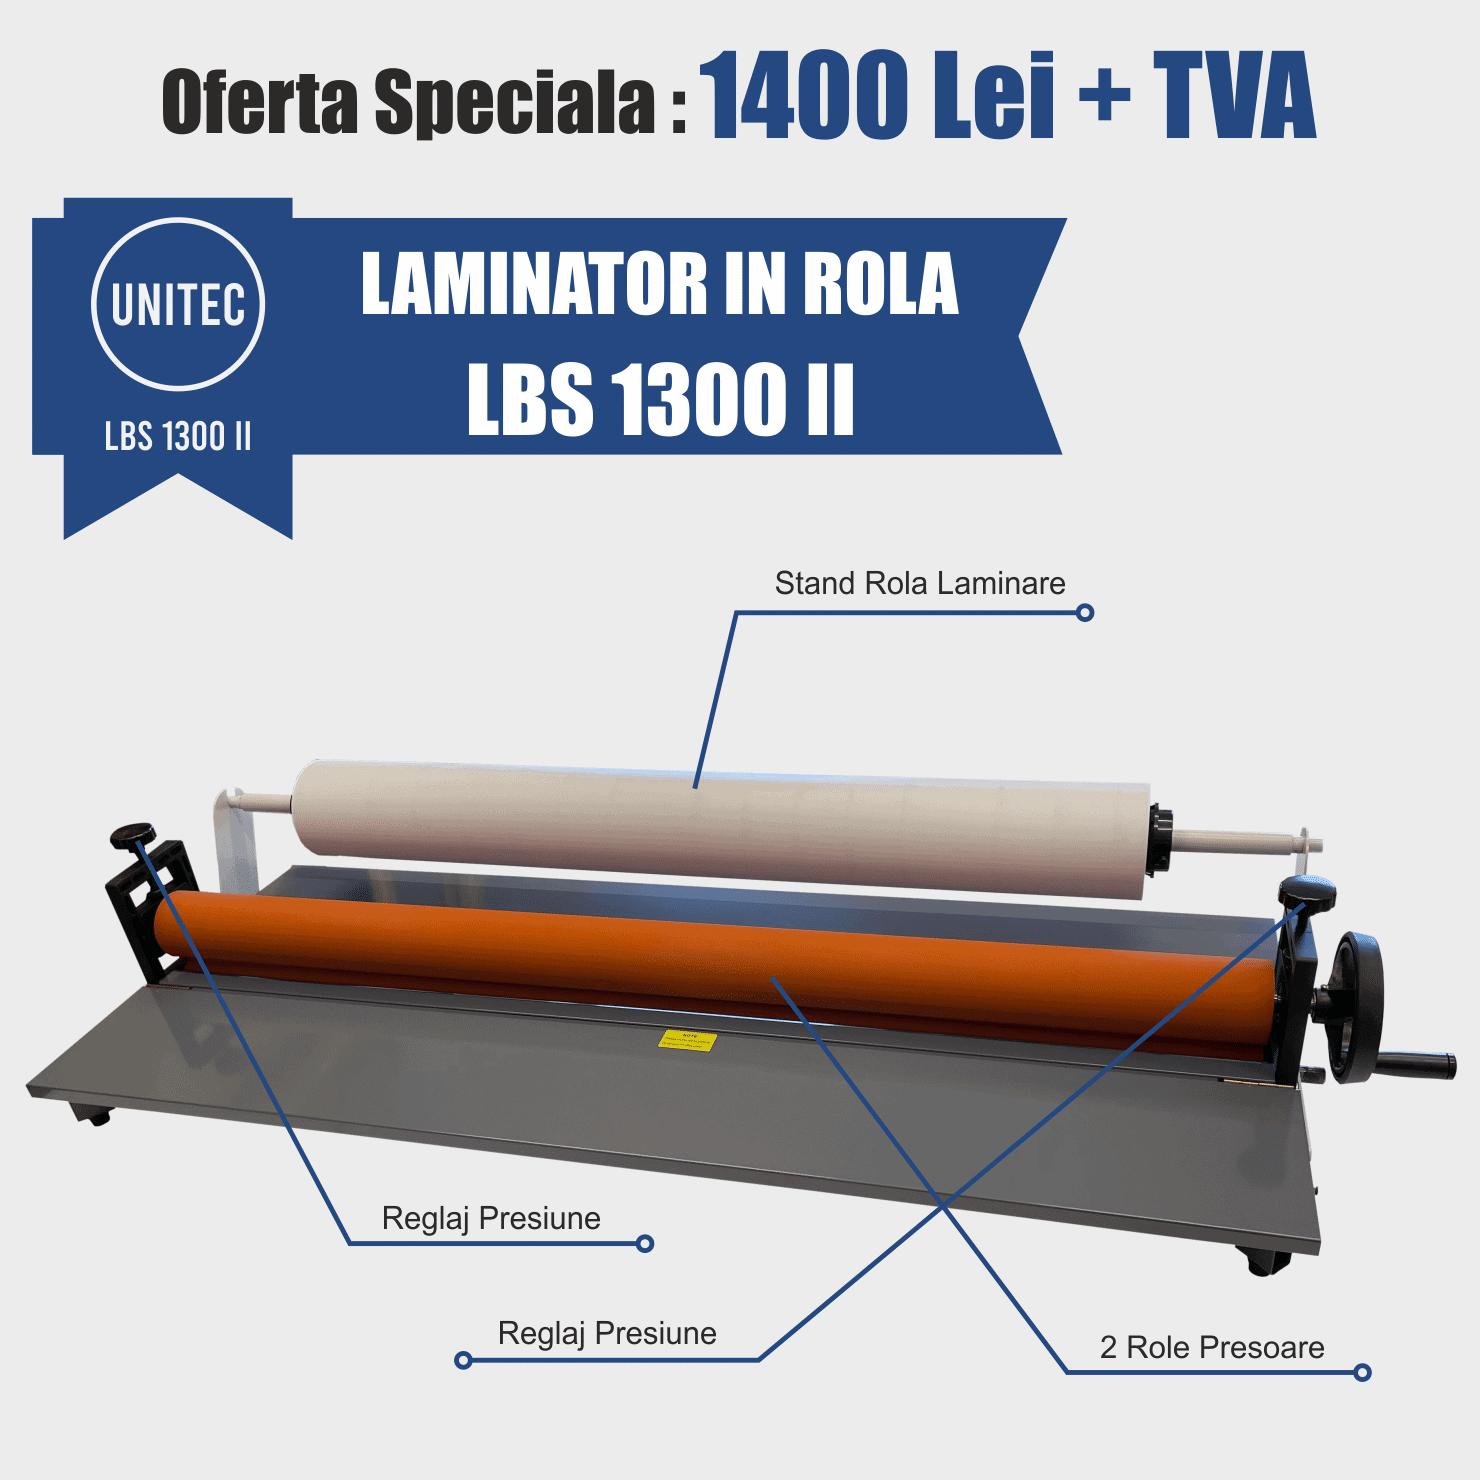 laminator in rola lbs 1300 II